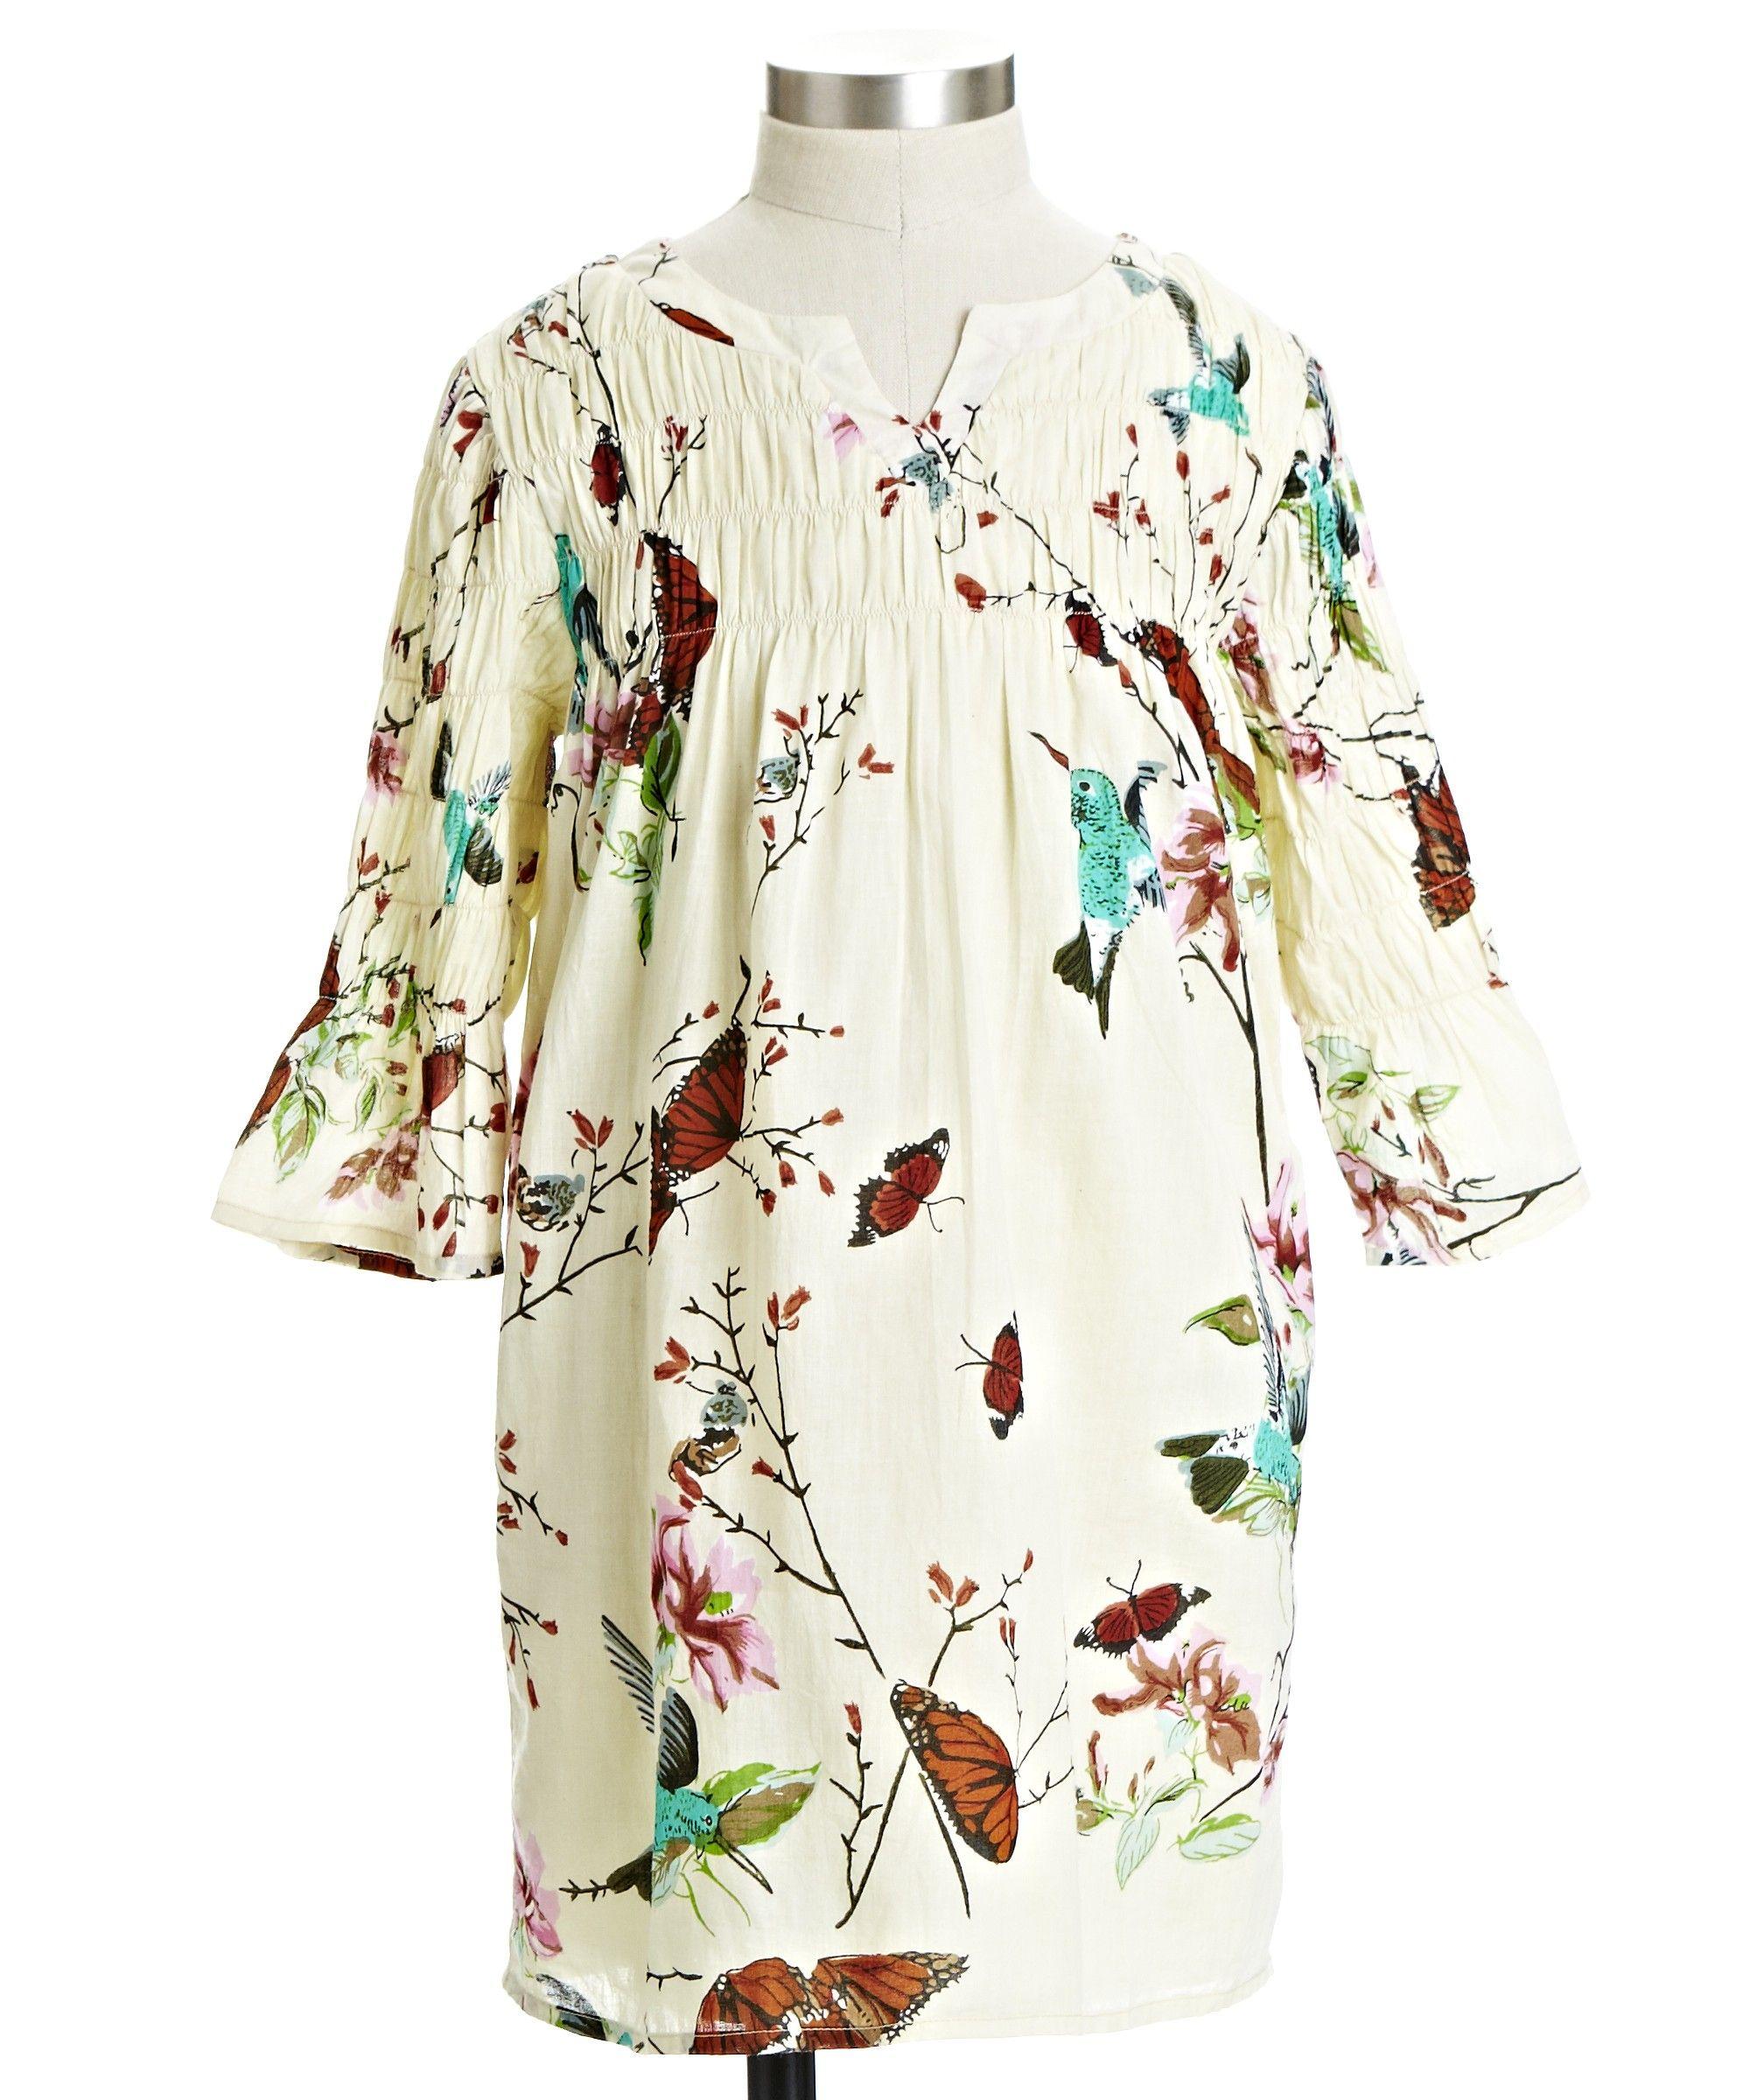 Feather Dress - Girls - Shop - new arrivals | Peek Kids Clothing